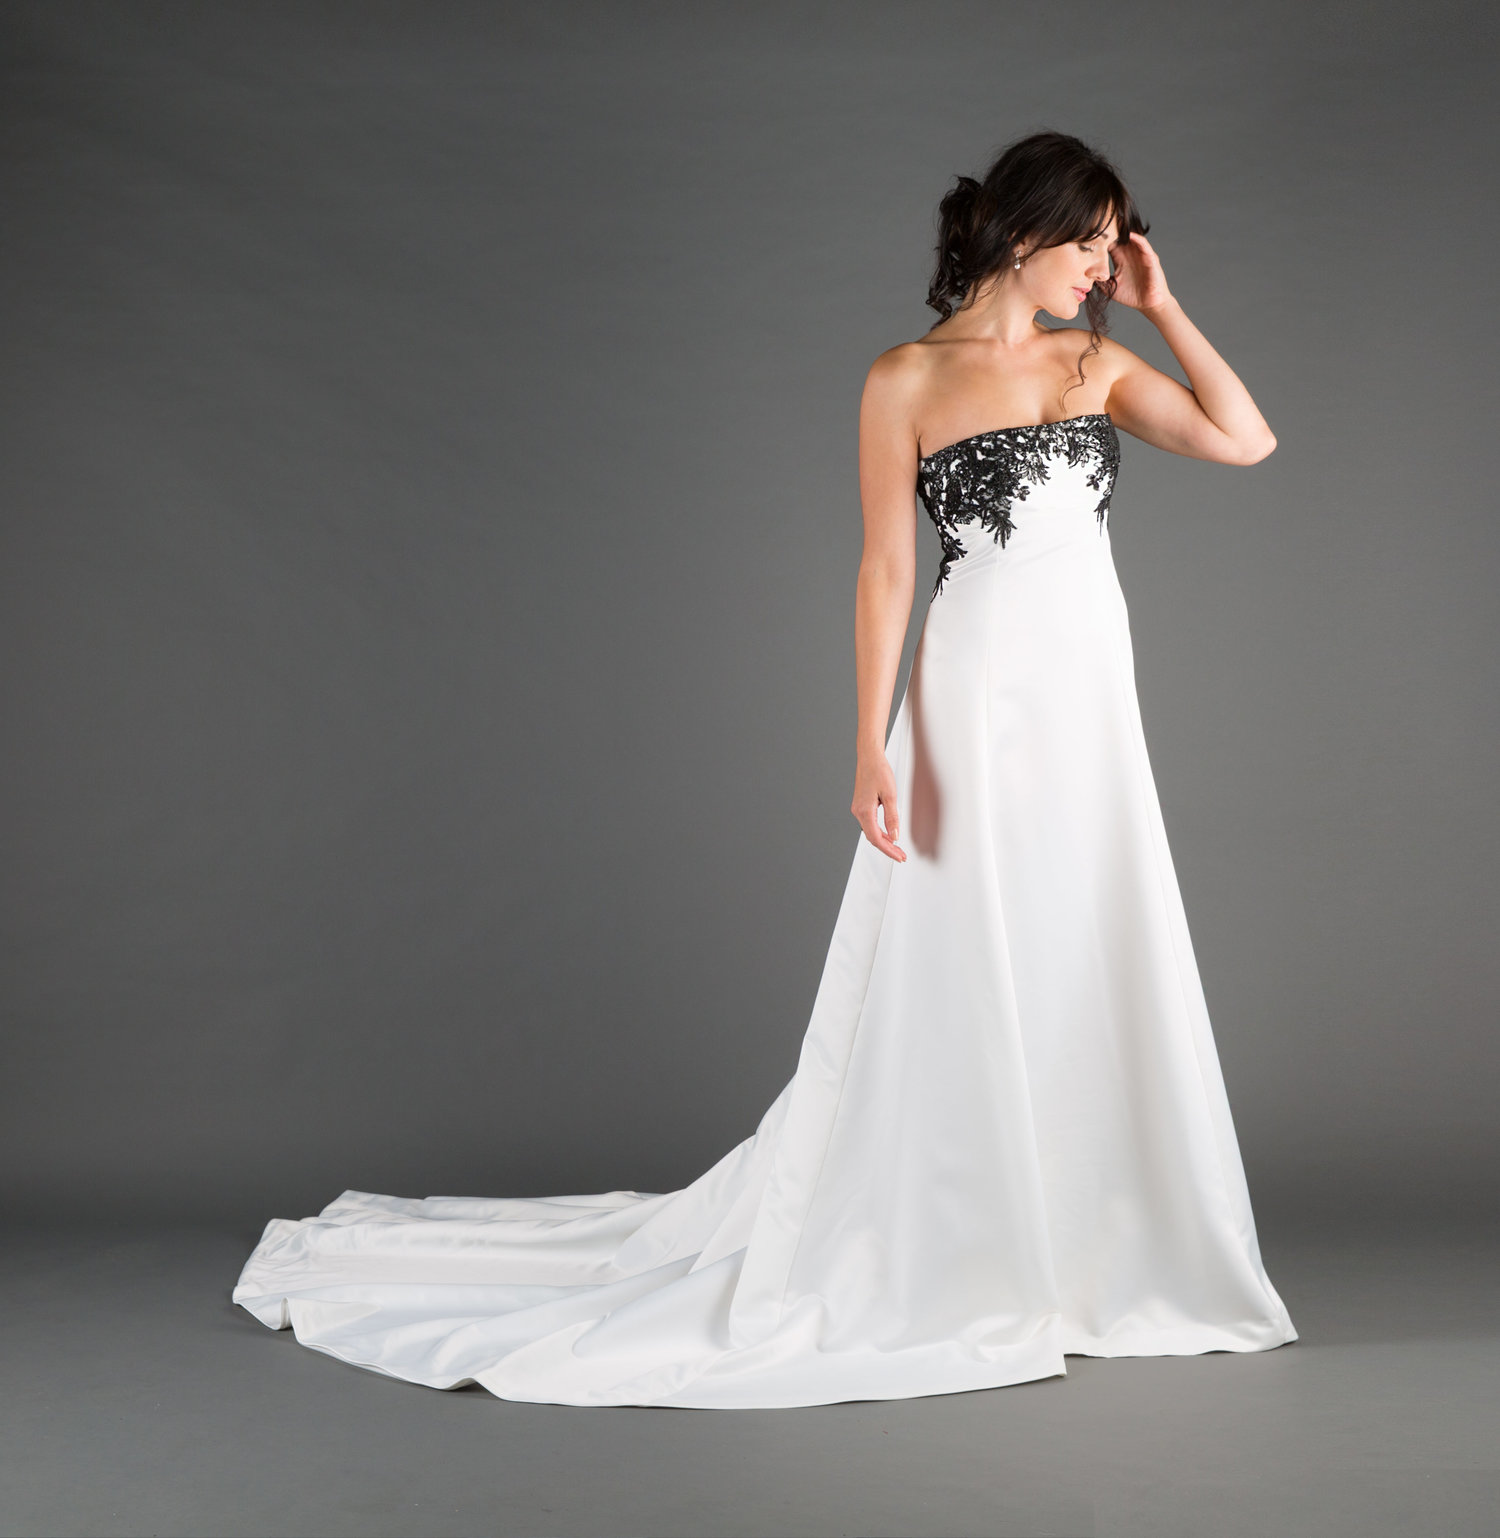 Bridal Gowns Wedding Dresses Ivory Black